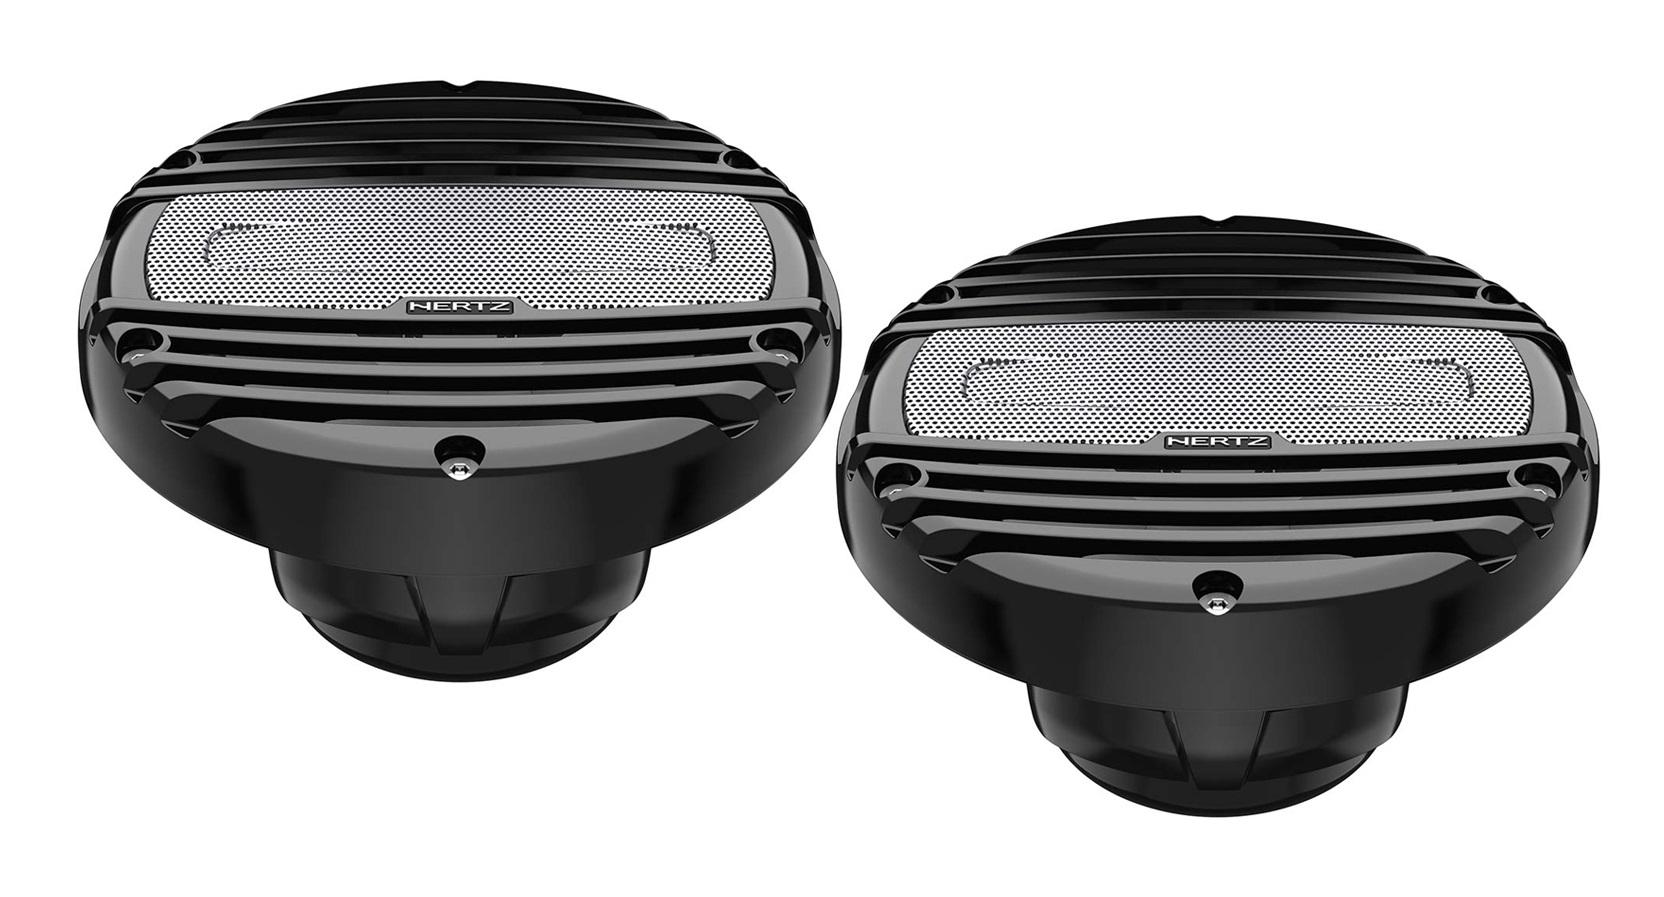 "Hertz HMX 6.5-LD-C Marine Outdoor Lautsprecher 6.5"" 4Ohm MARINE COAX BLACK RGB"